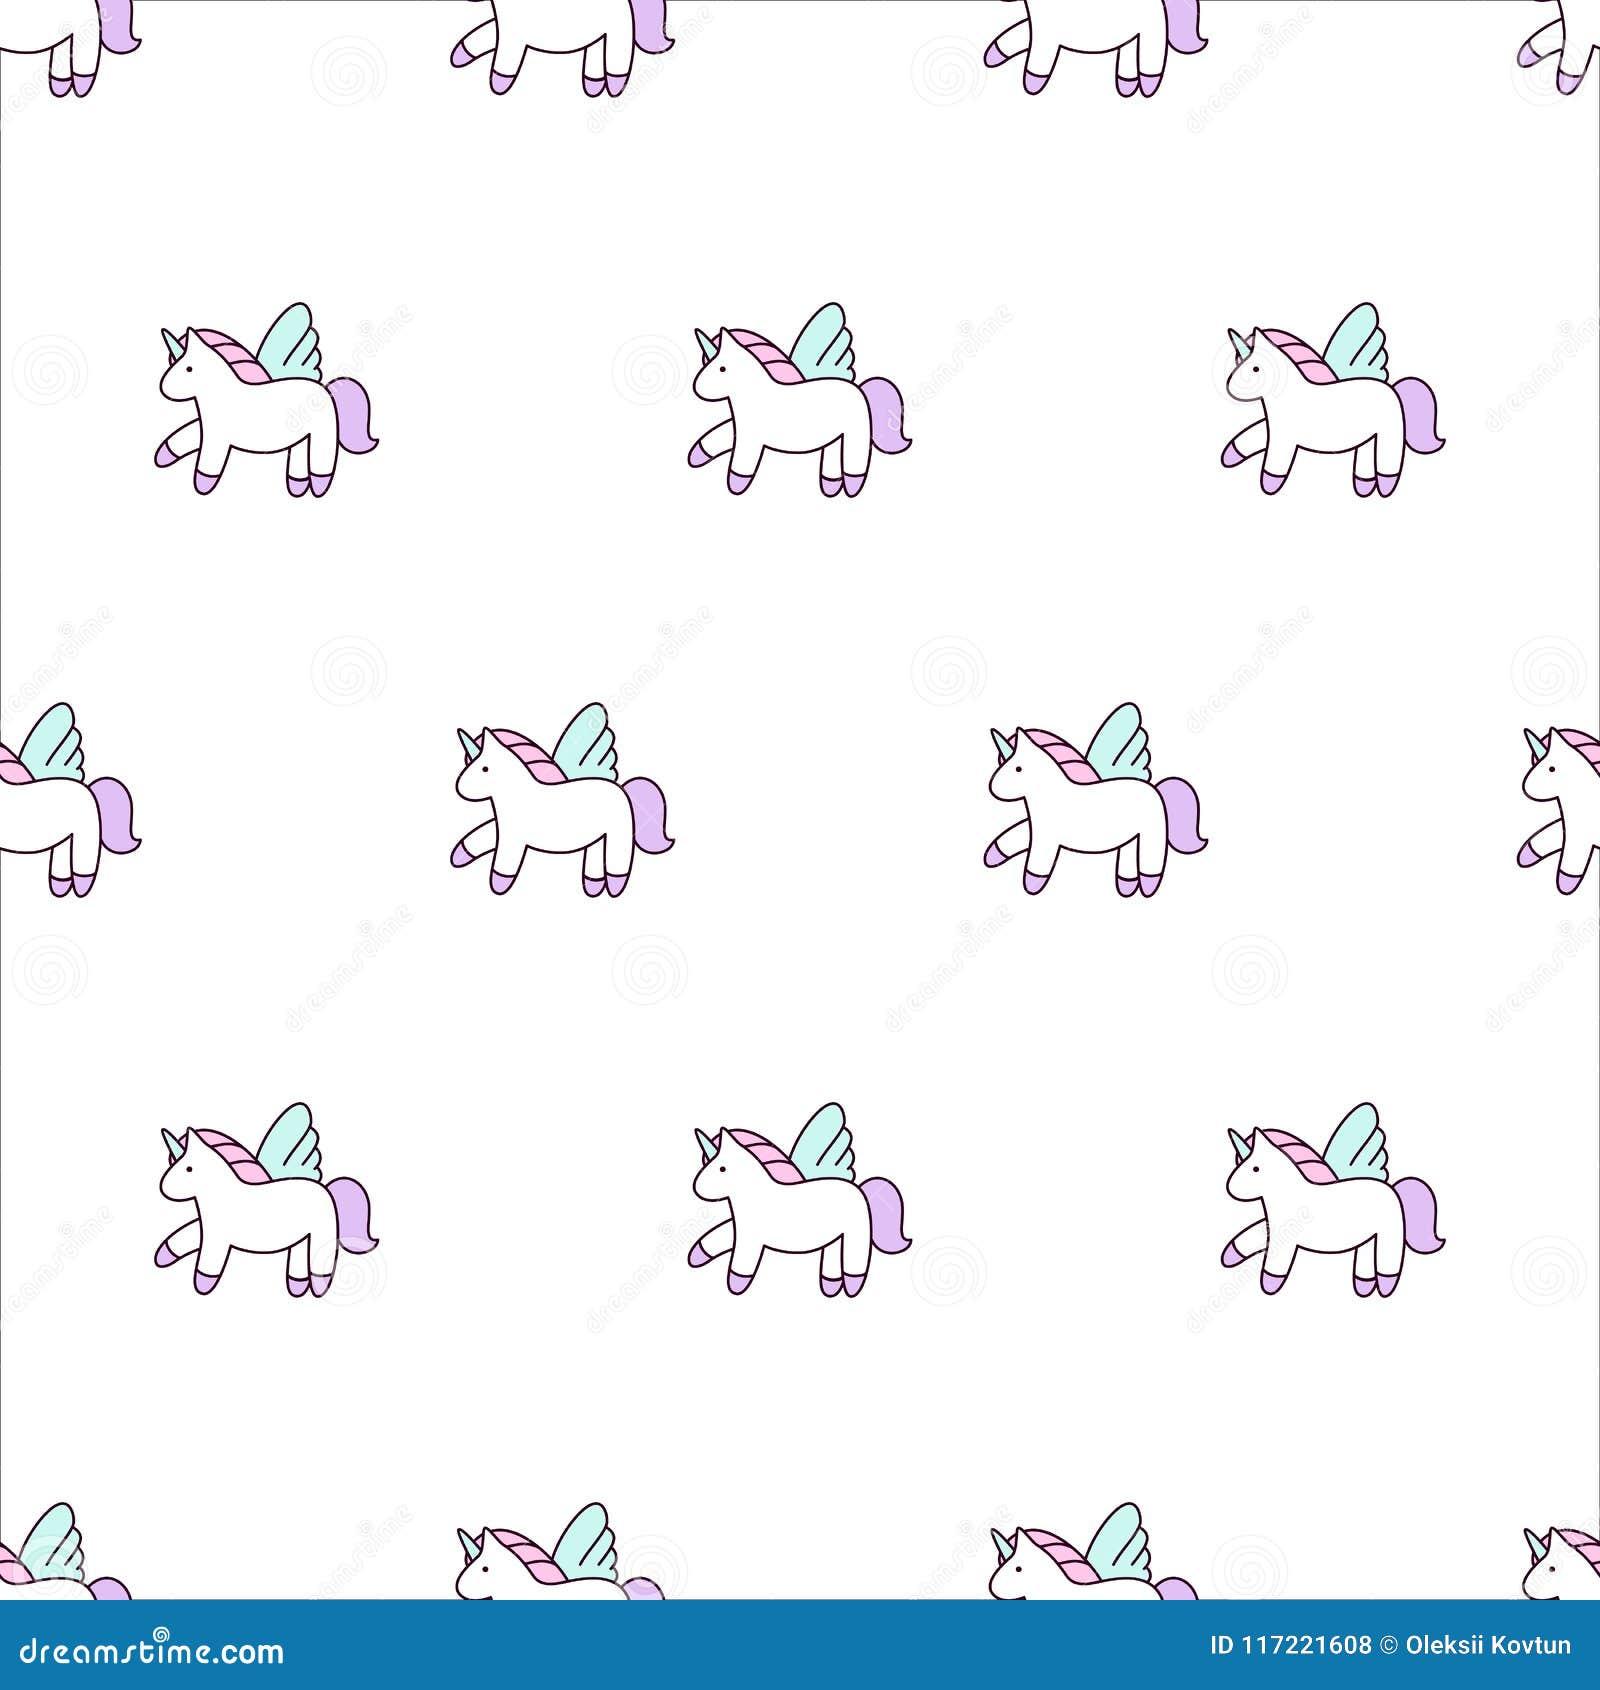 Unicorns Vector Illustration Seamless Pattern Rainbow Unicorns On Colorful Background Cute Wallpaper Stock Vector Illustration Of Fairytale Fantasy 117221608